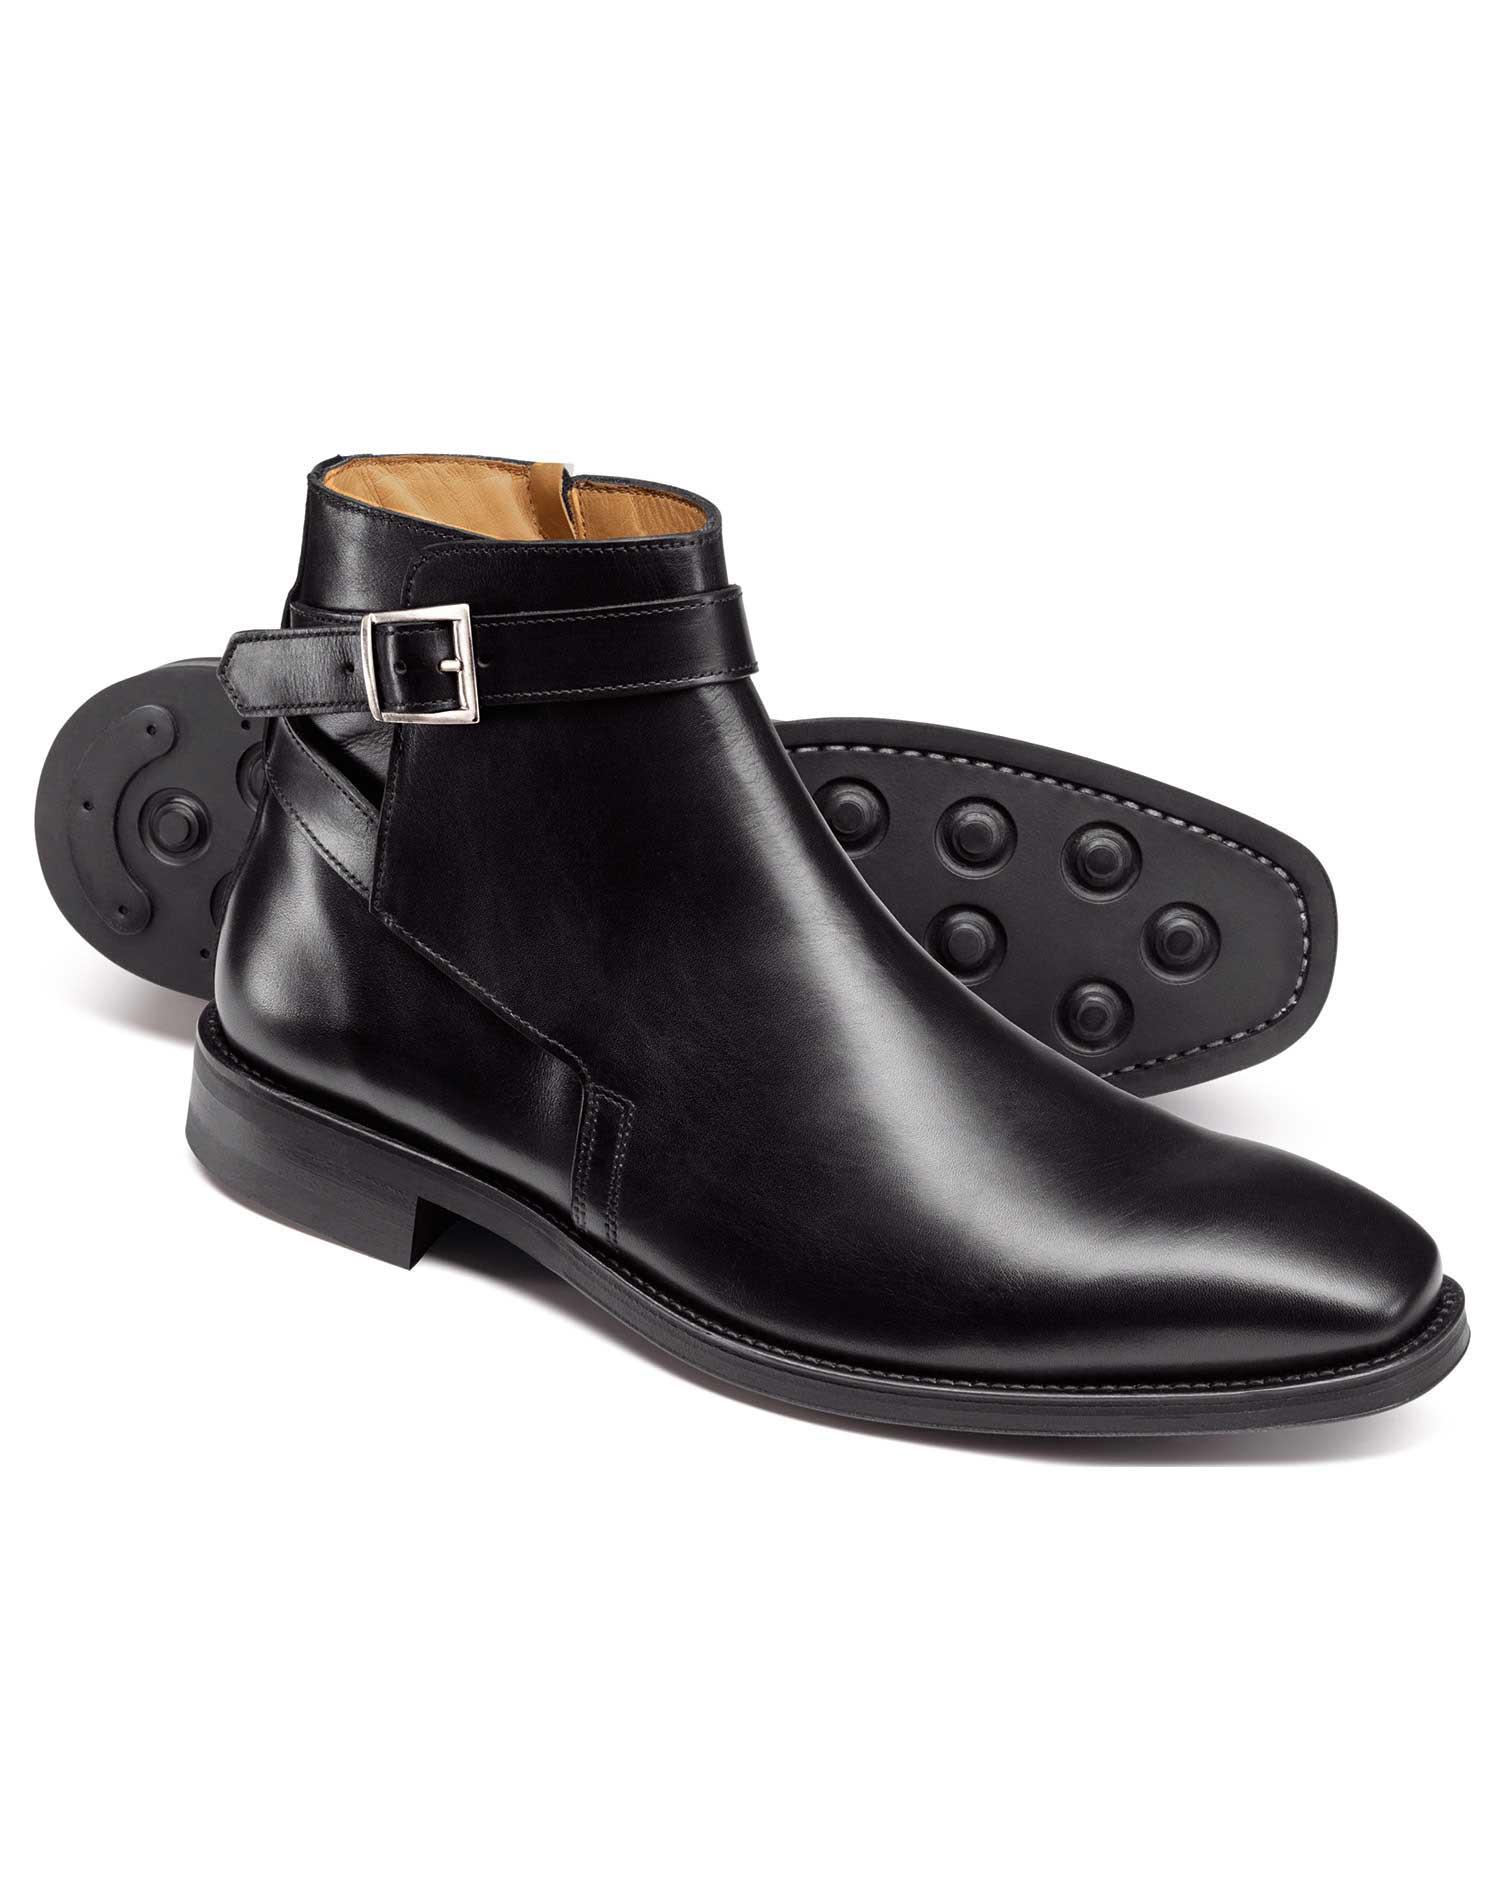 Black Jodhpur Boots Size 11 R by Charles Tyrwhitt